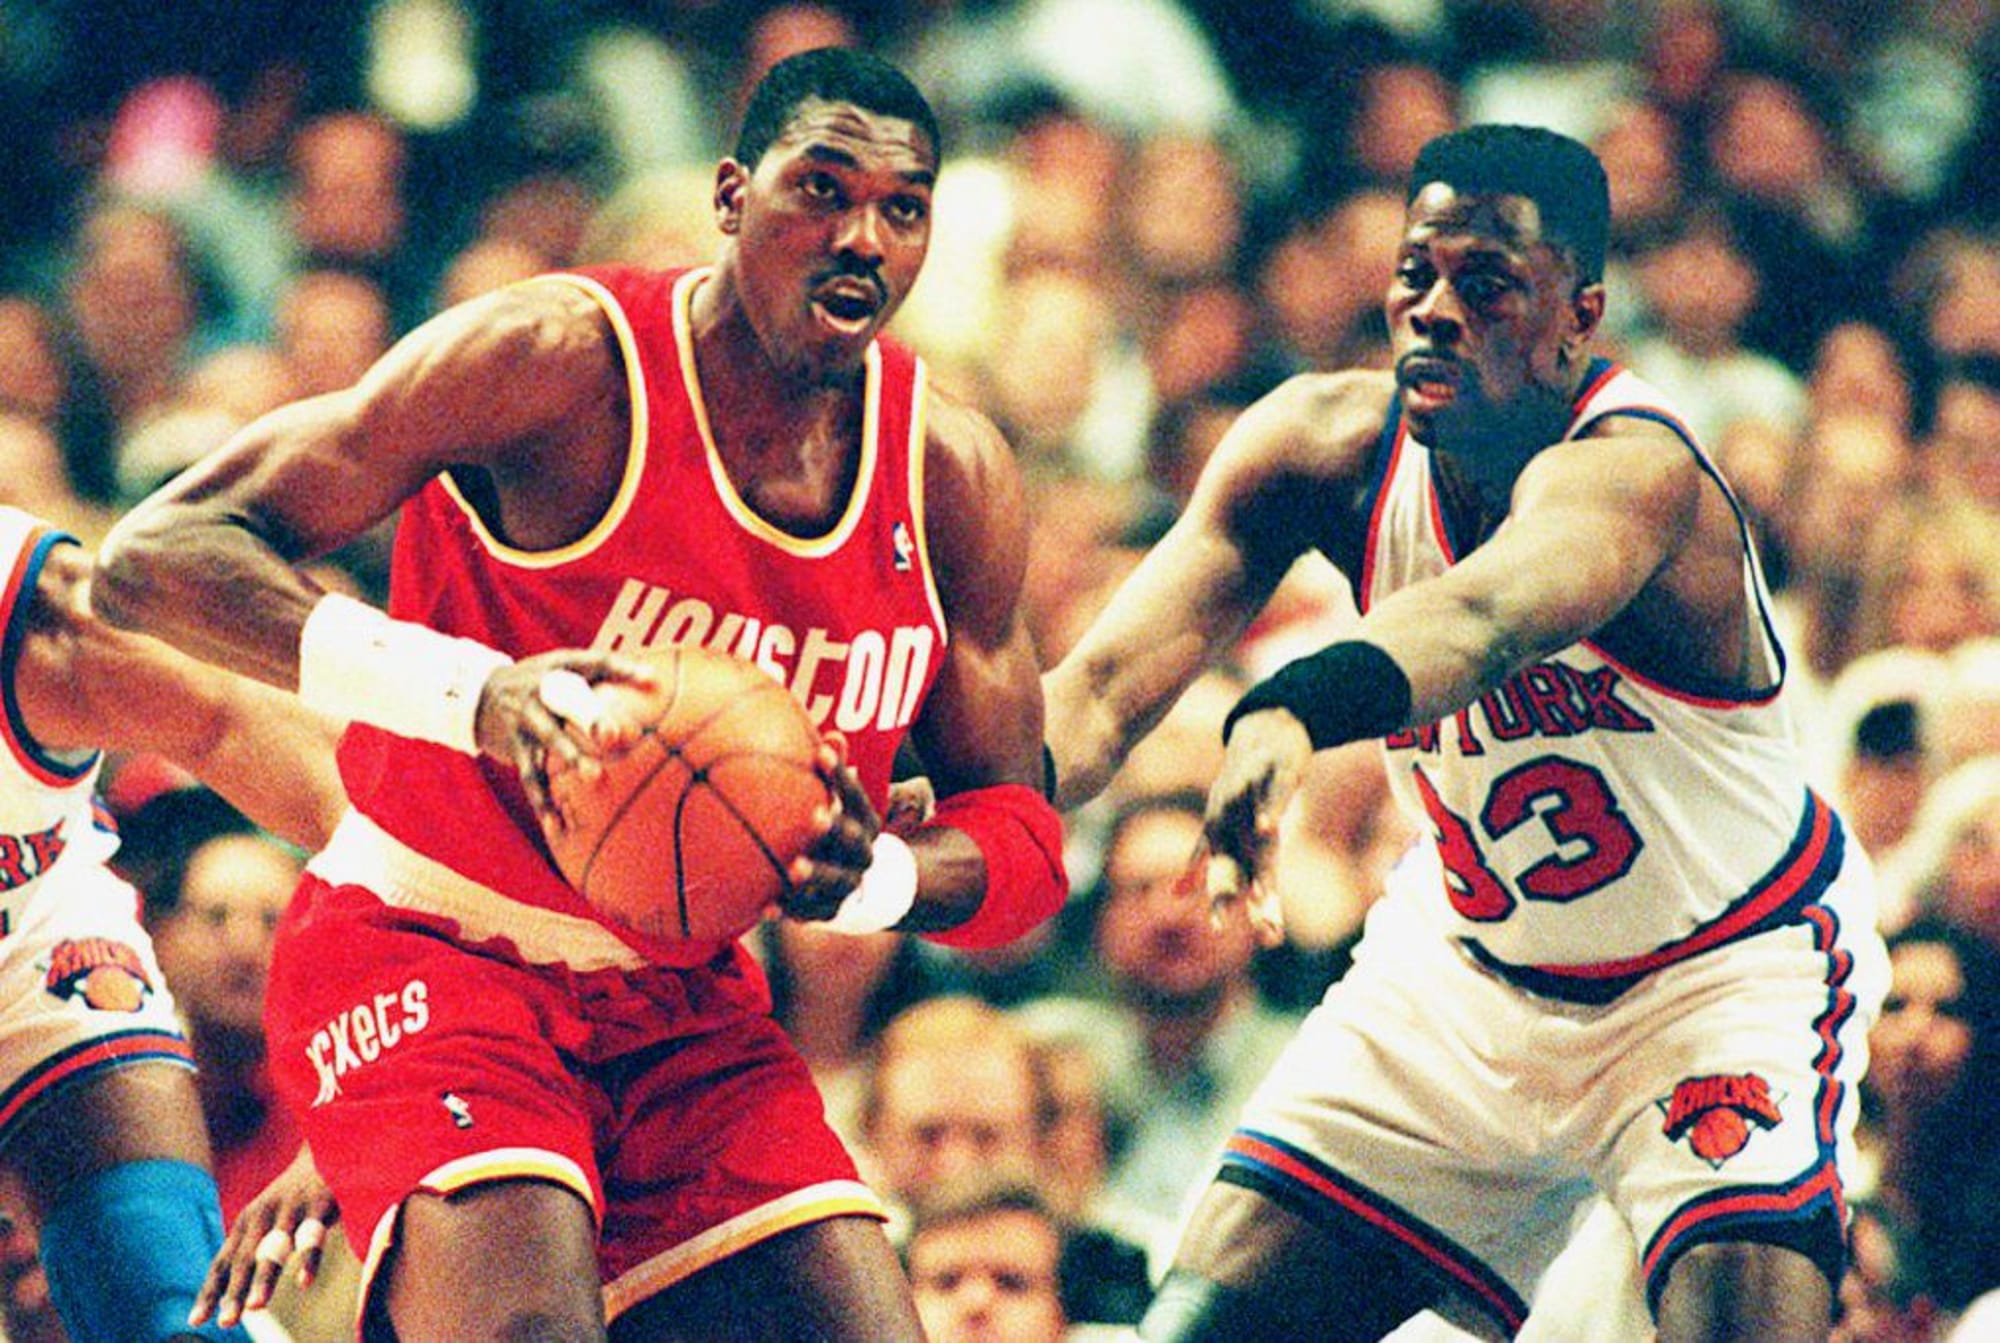 Paul Pierce praises Rockets' Hakeem Olajuwon